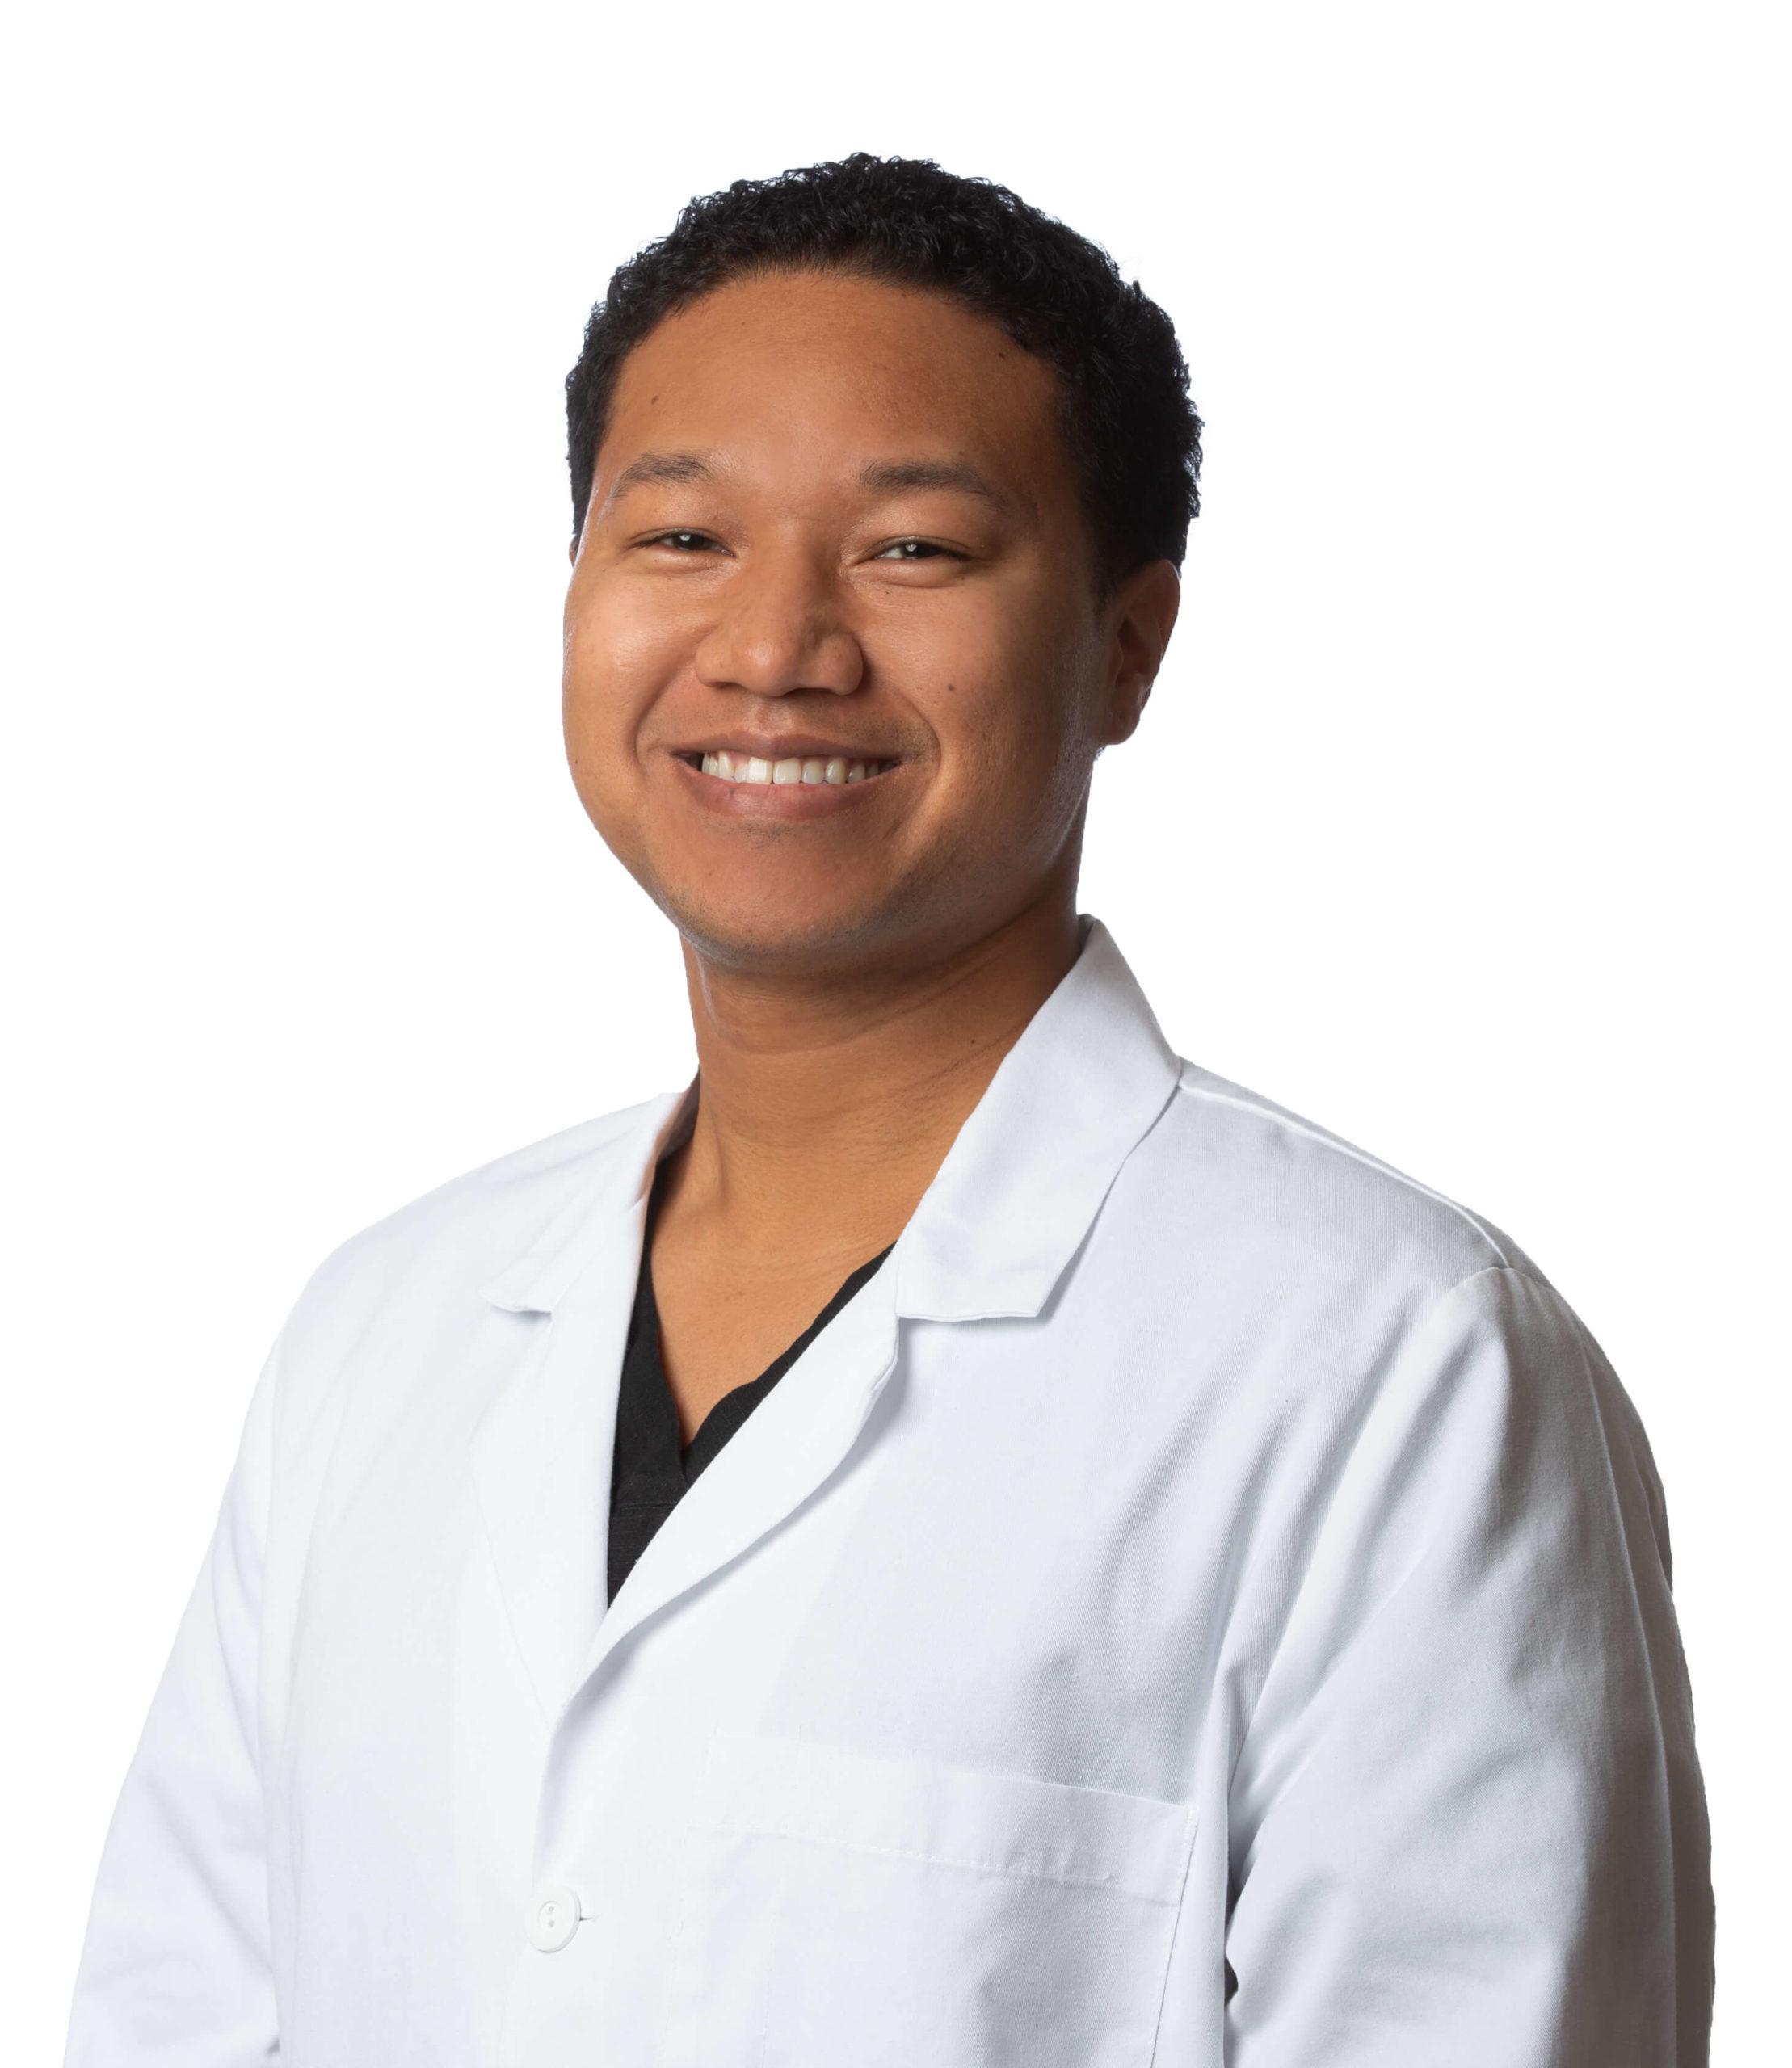 Dr. Brandon Murray headshot